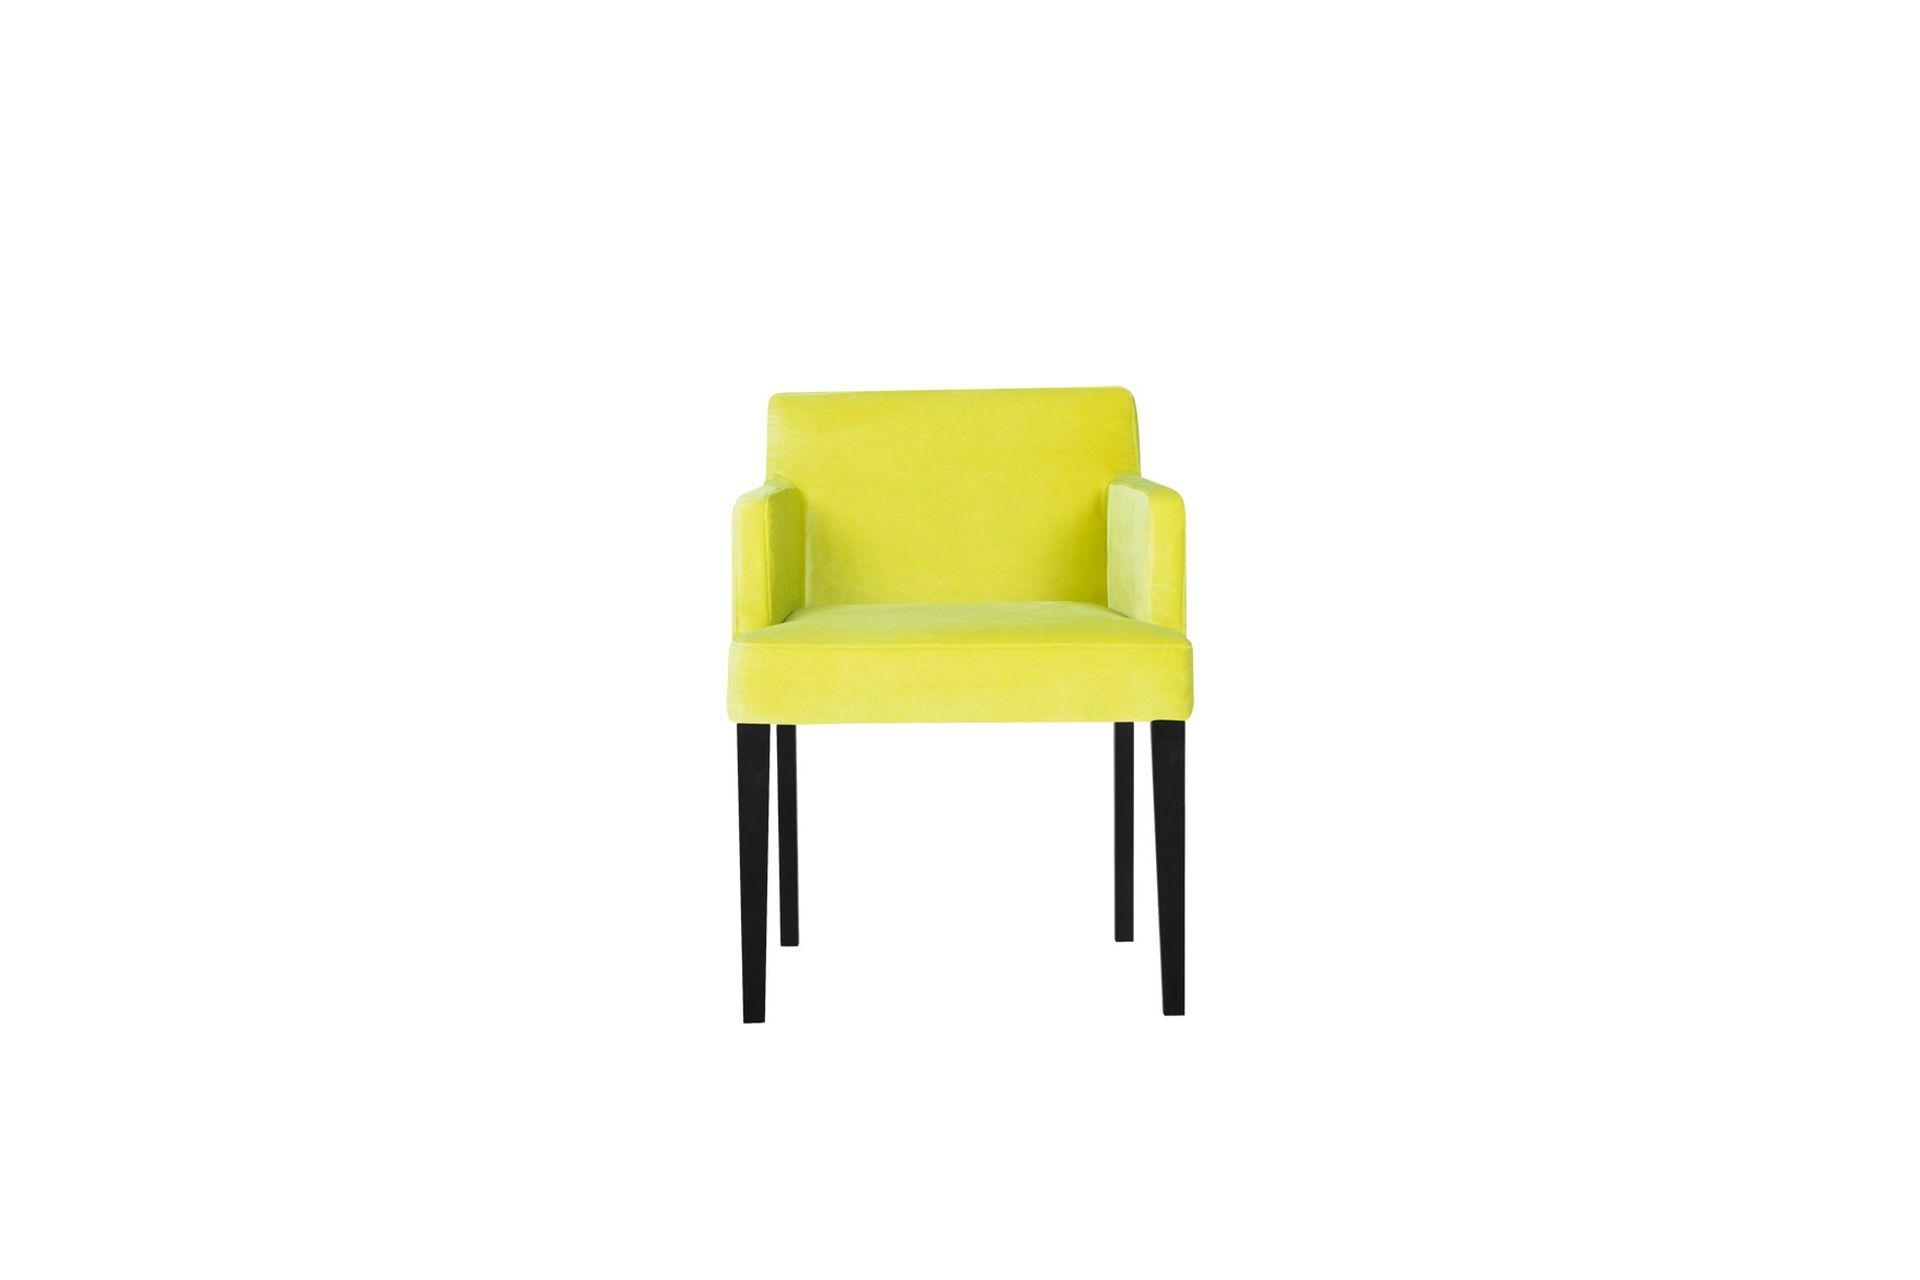 Кресло linn (sits) желтый 57x74x57 см.